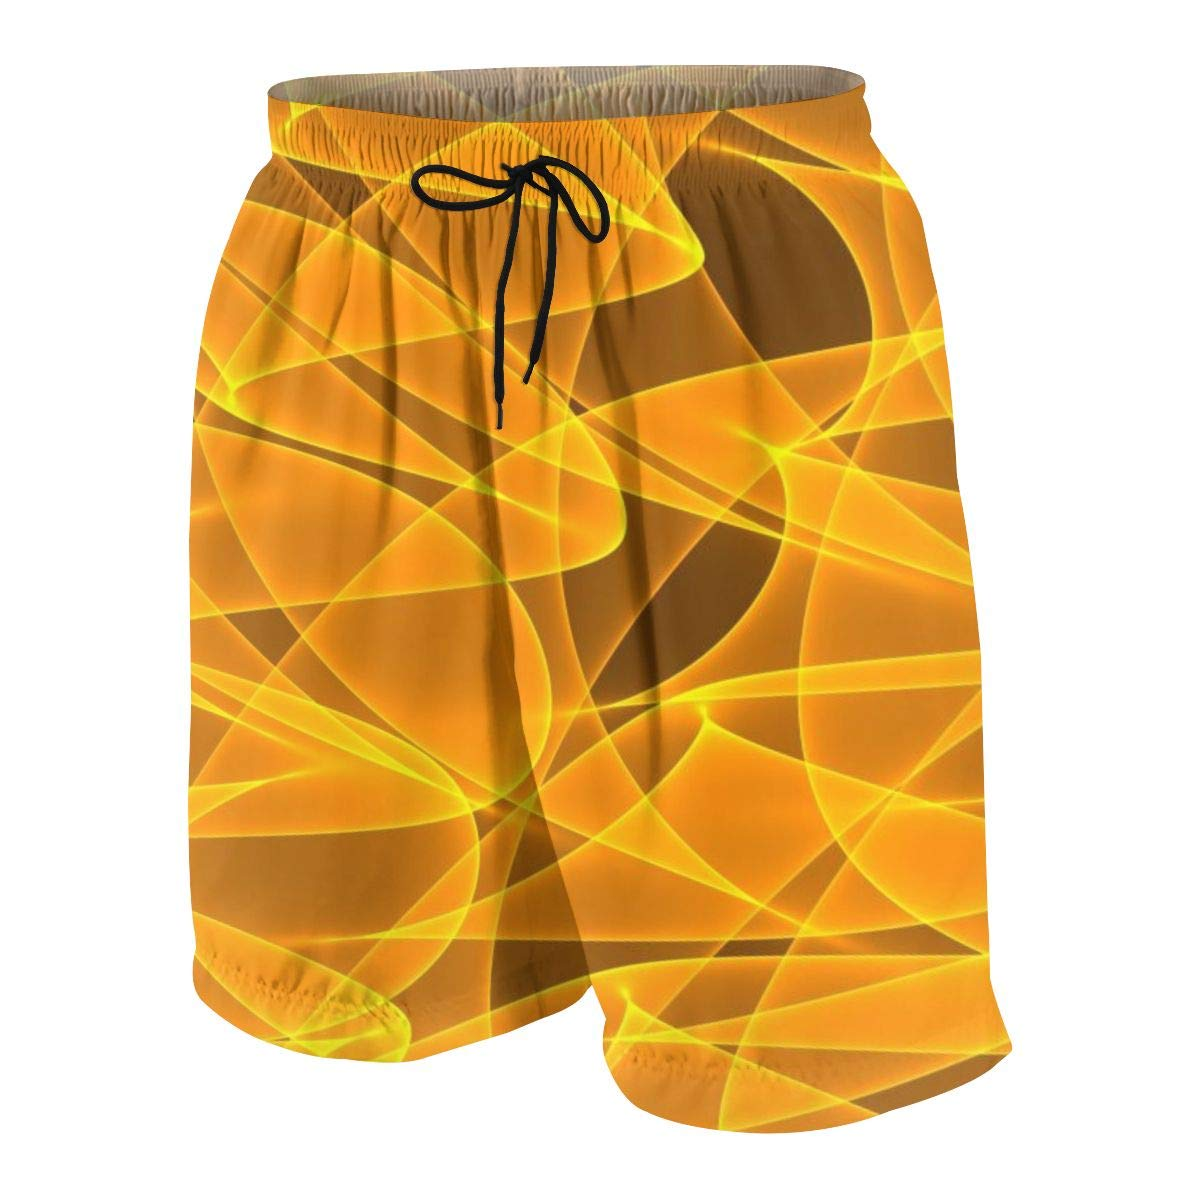 Teen Comfortable Hawaii Beach Leisure Vintage Beach Shorts Swim Trunks Board Shorts